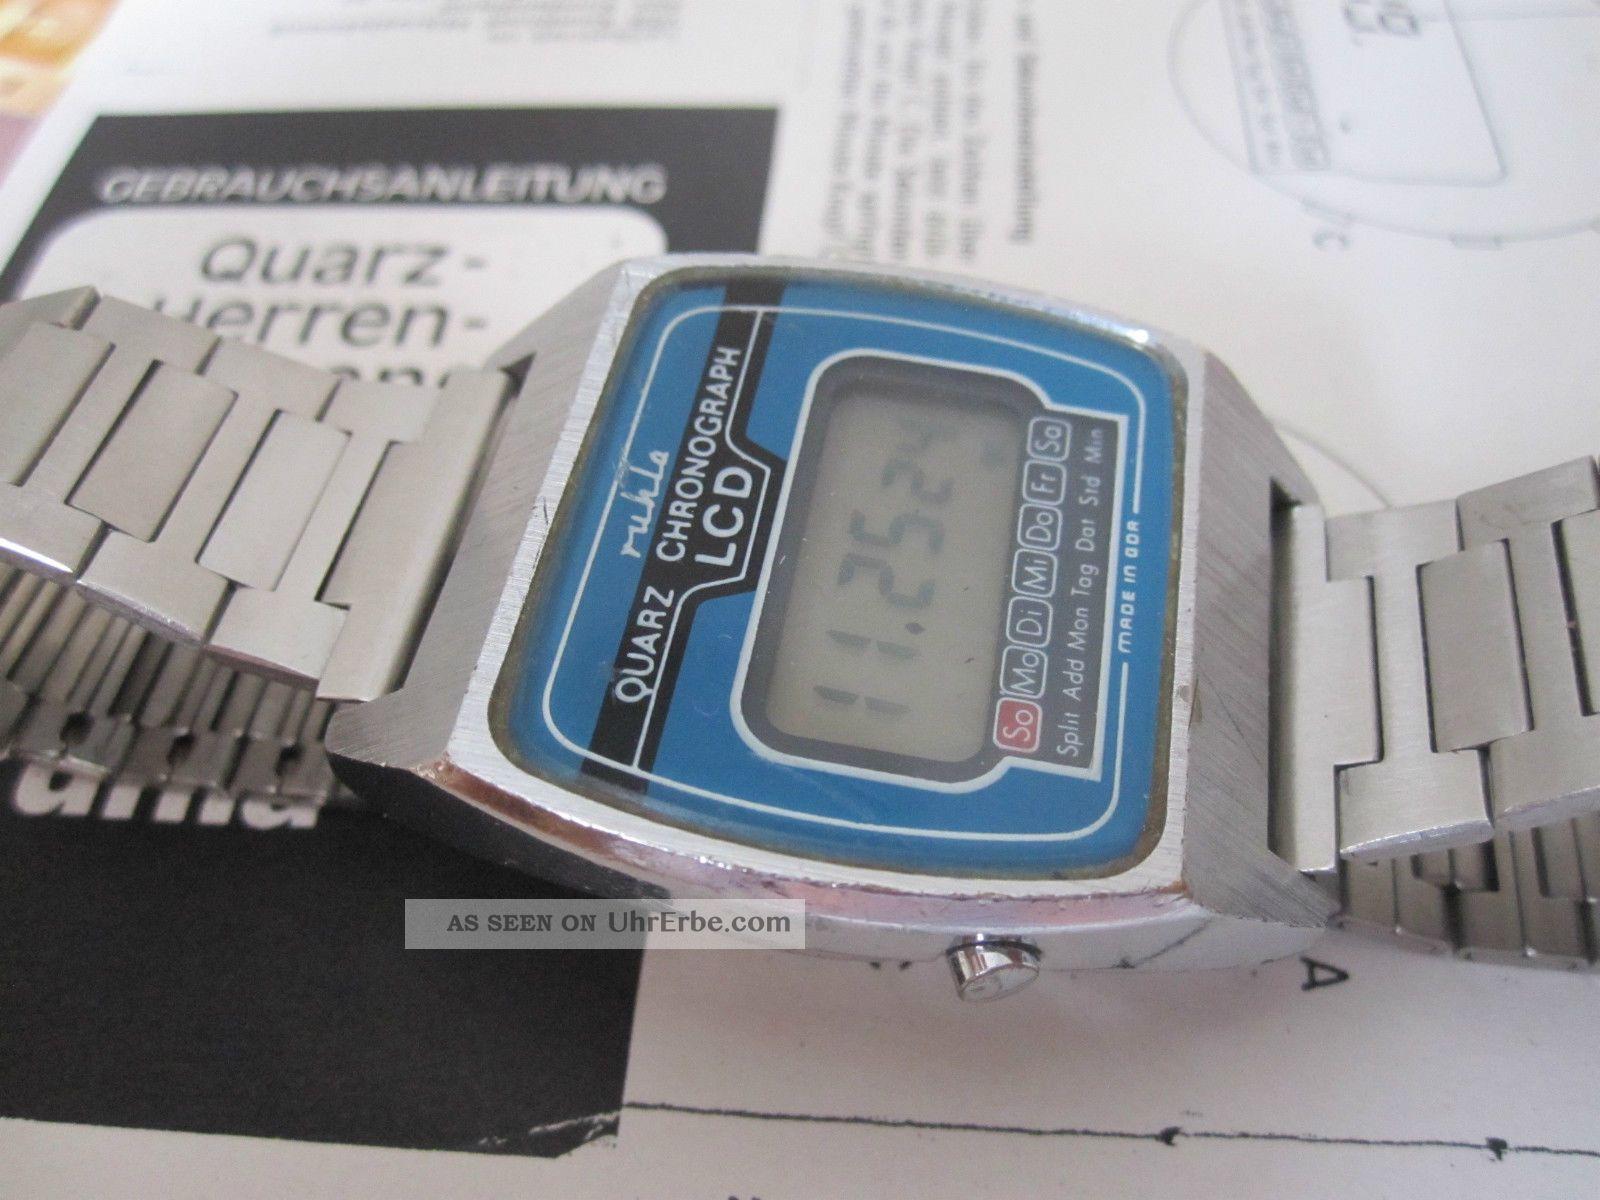 Ruhla Lcd Digital Ddr Quartz Uhr Mit Metallband Kaliber 22 ...